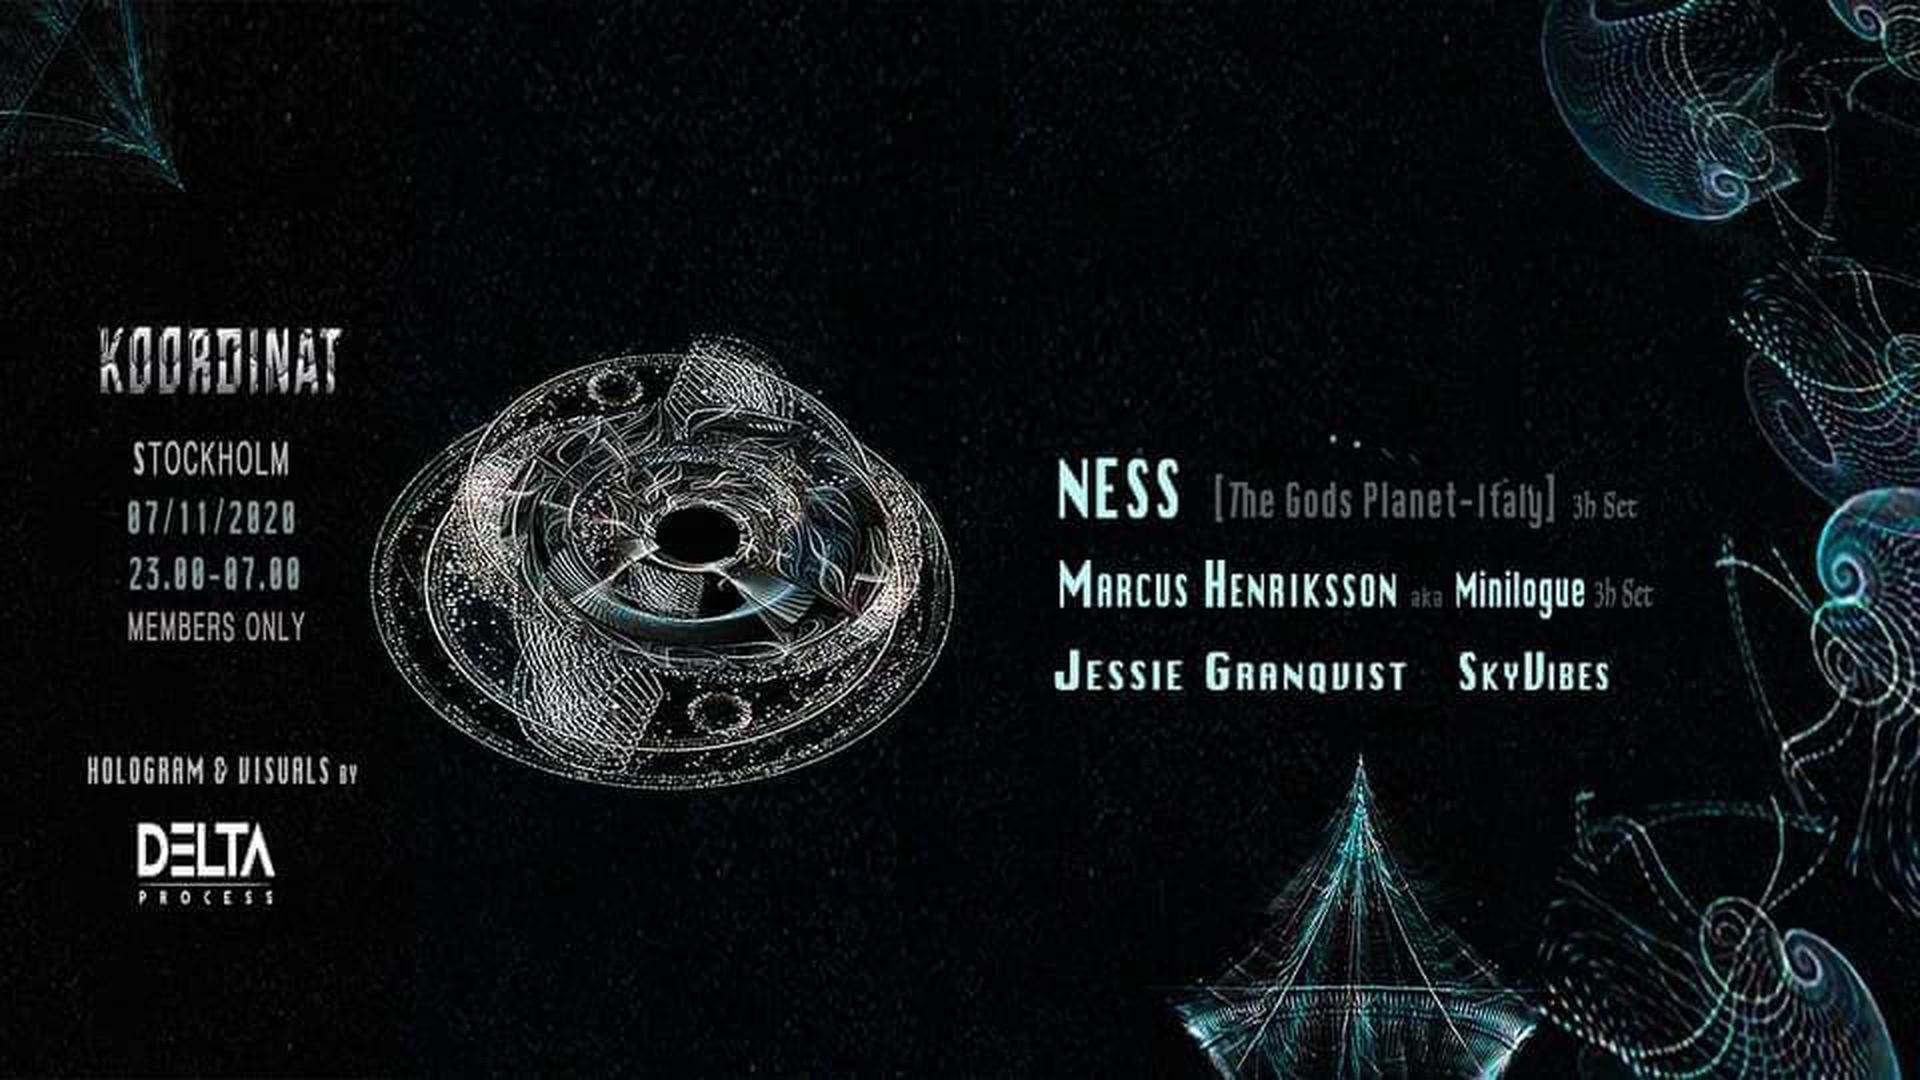 Event: Koordinat (Ness, Marcus Henriksson - Hologram Show by DeltaProcess)